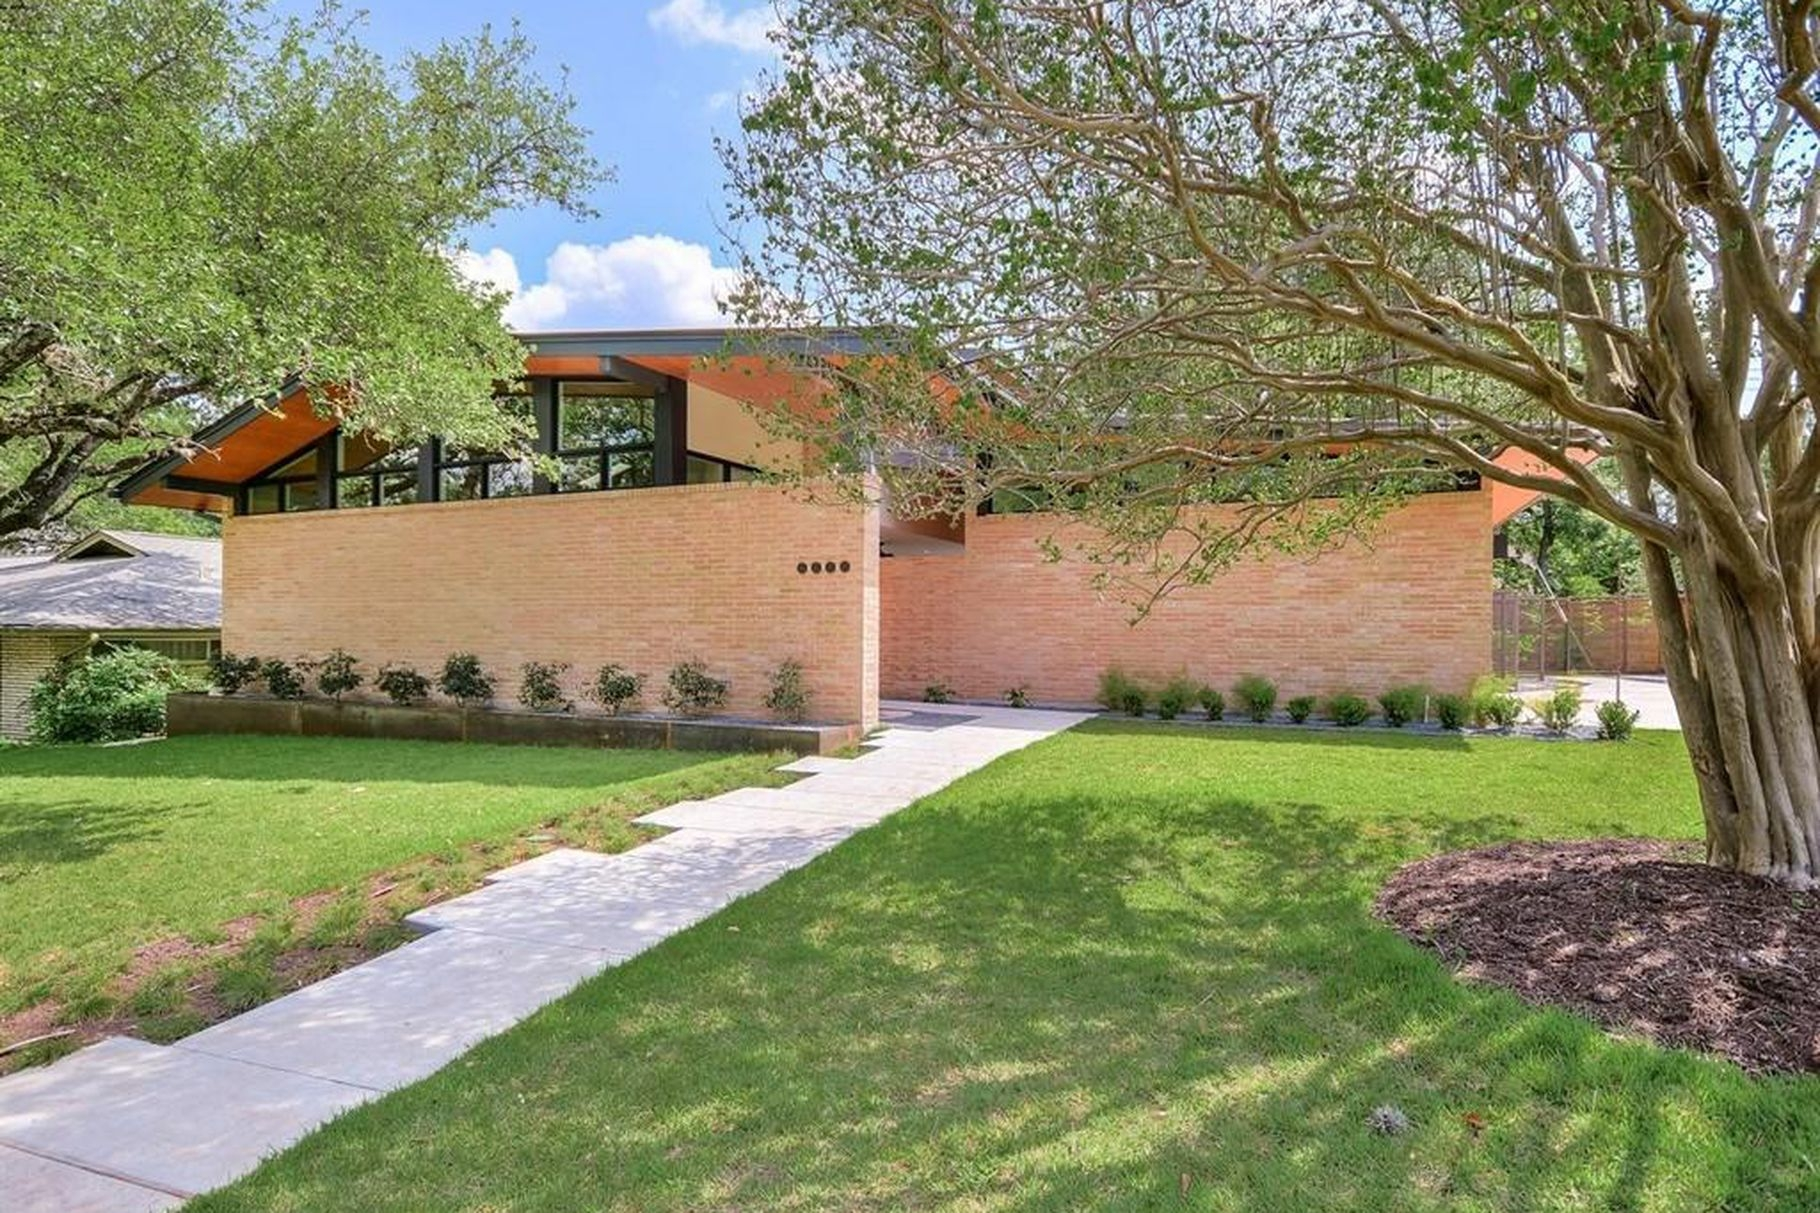 Northwest Hills Stunner Inspired by Midcentury-Modern Style - Curbed Austin, 2018